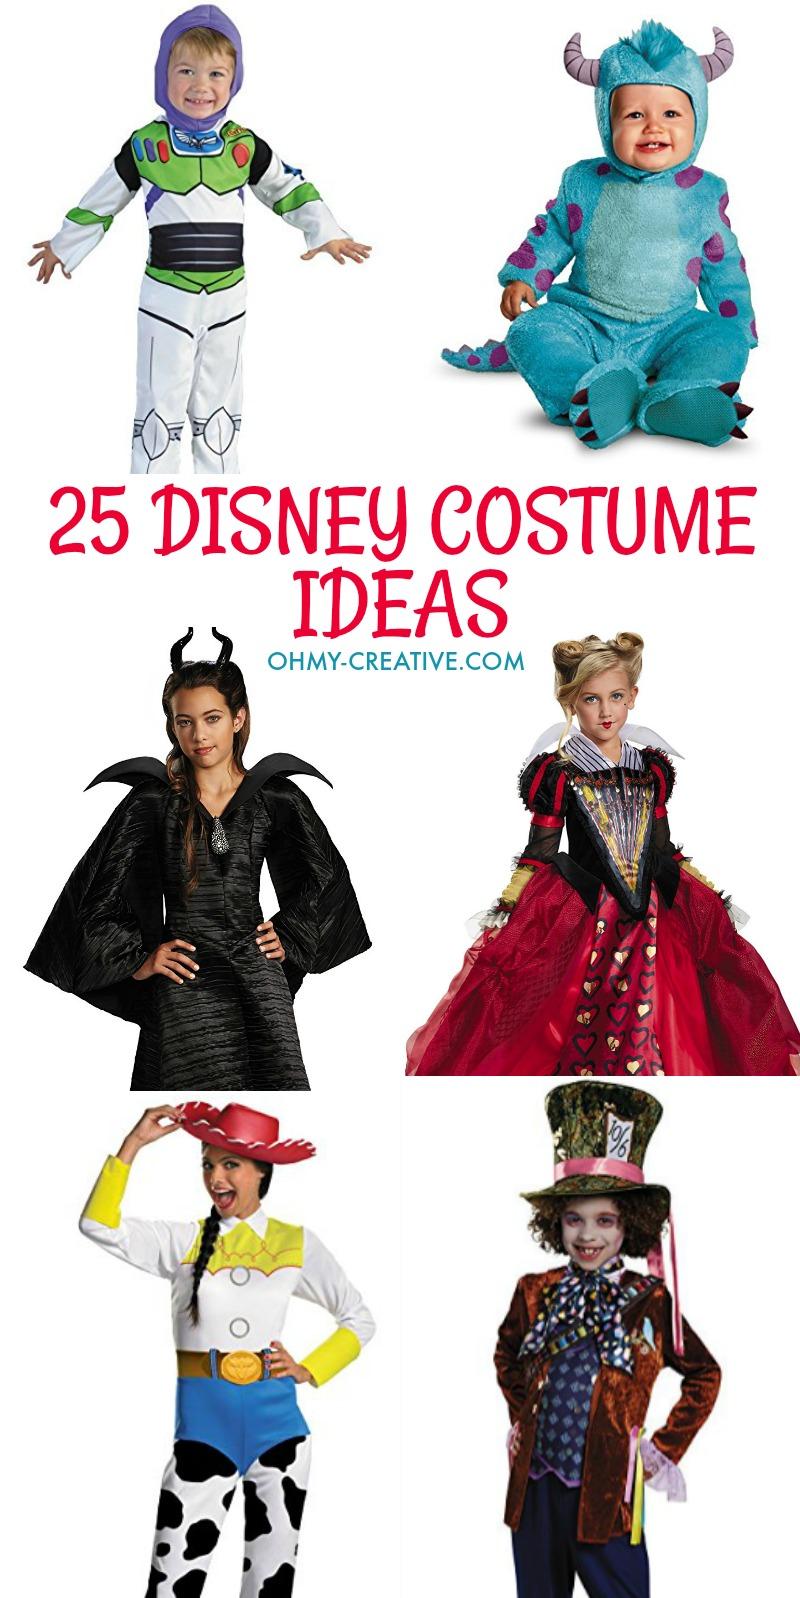 25 idées de costumes Disney ohmy creativecom Disney costumes d'Halloween Disney